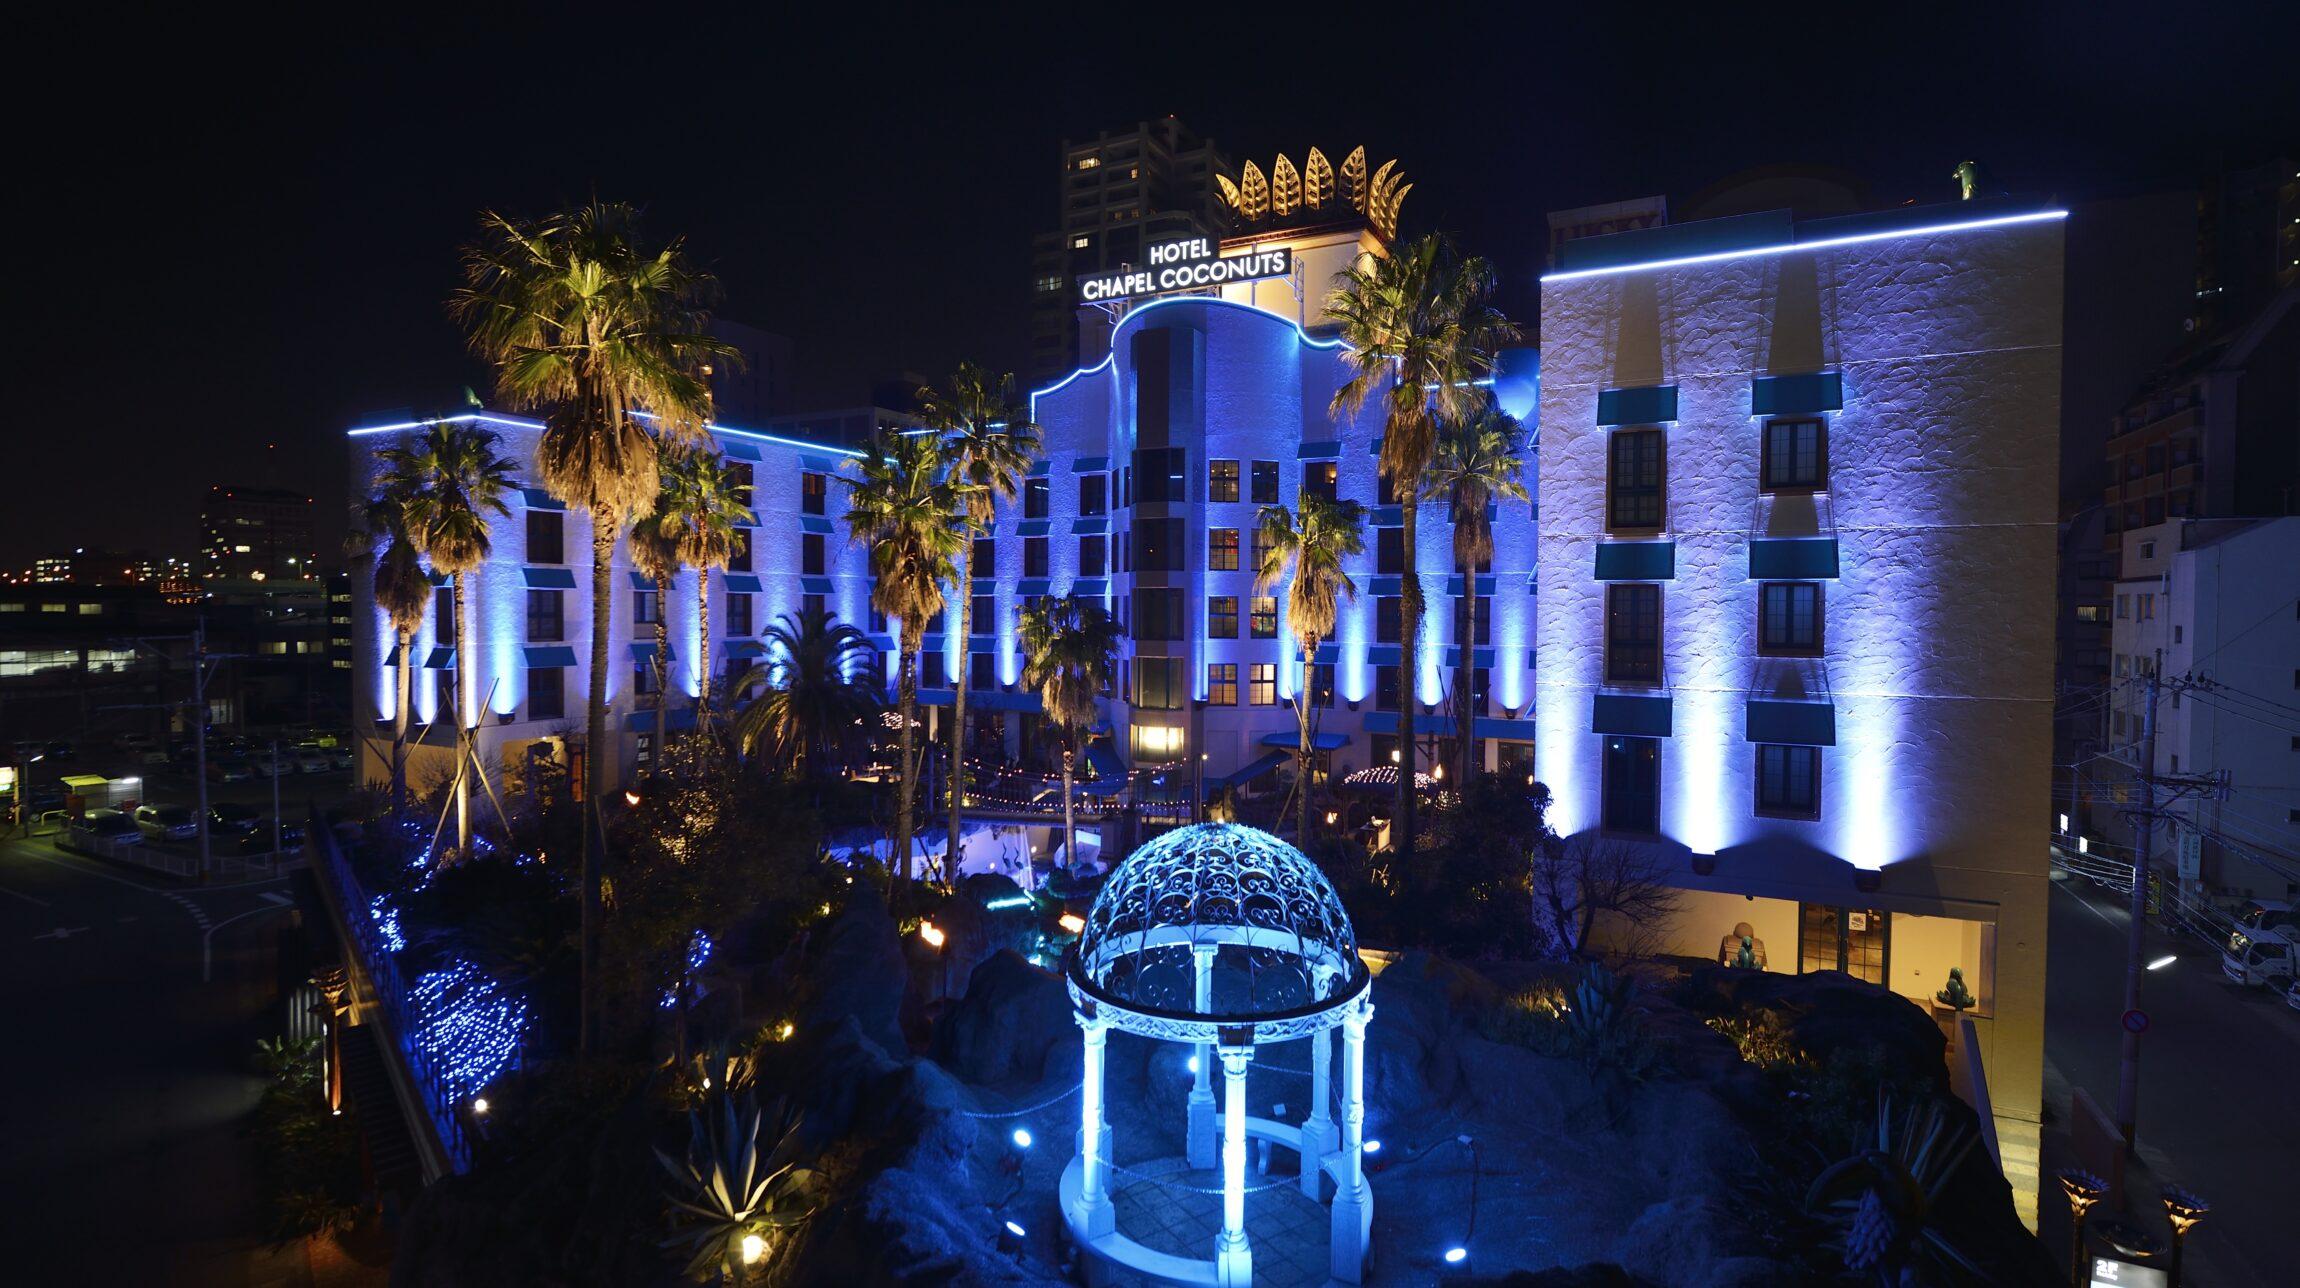 CHAPEL COCONUTS HOTEL IPOLANI